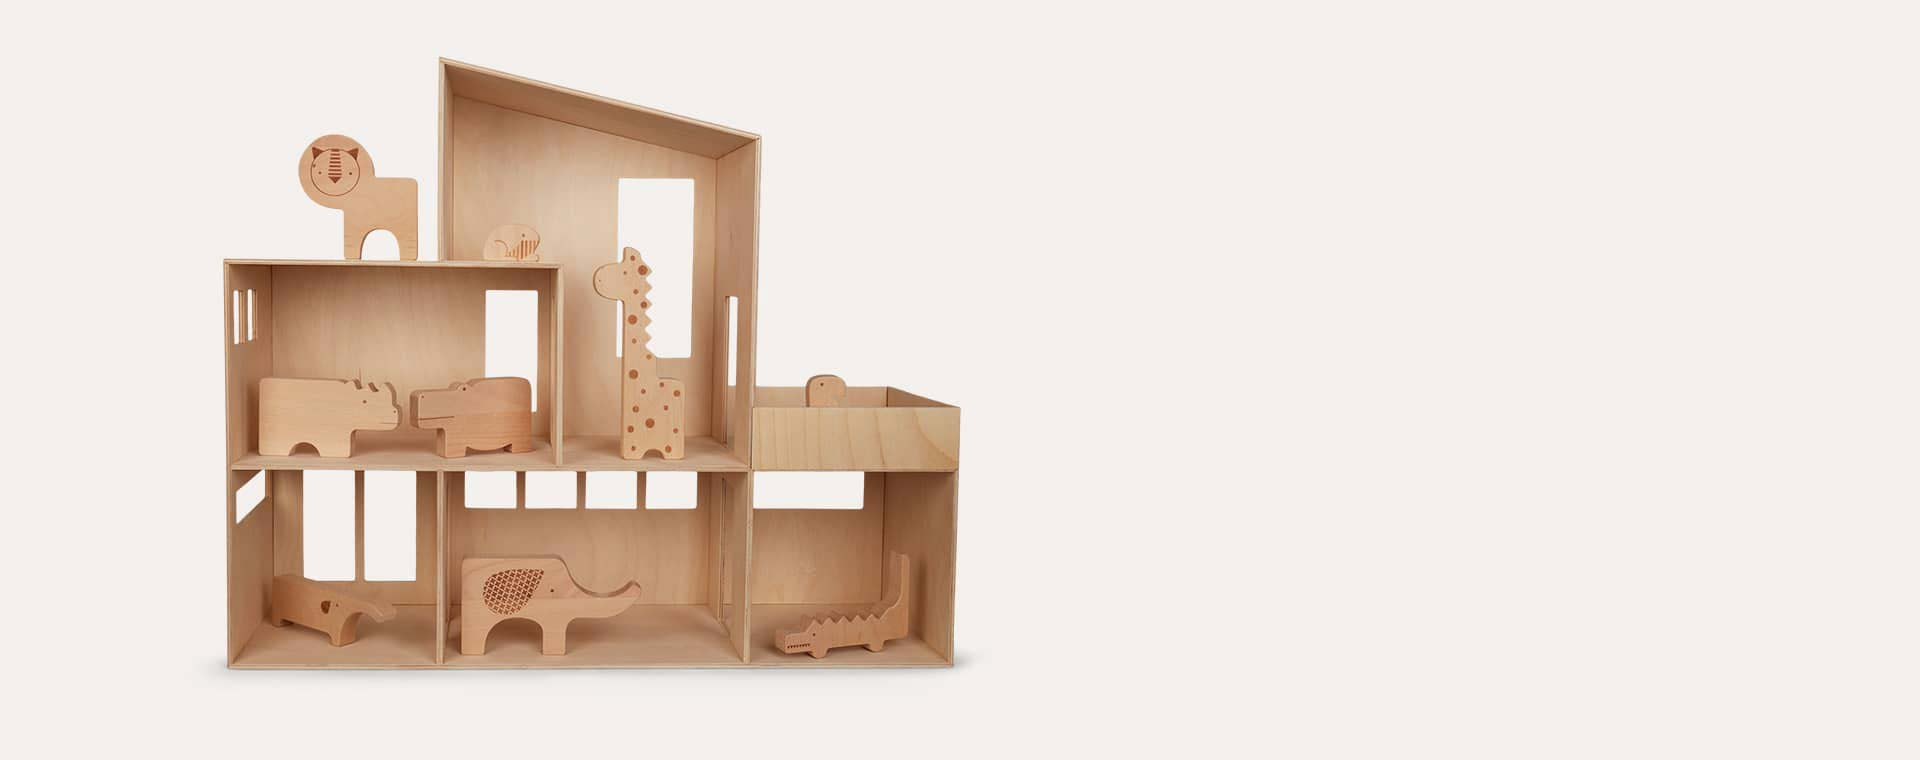 Neutral Ferm Living Miniature Funkis House - Large